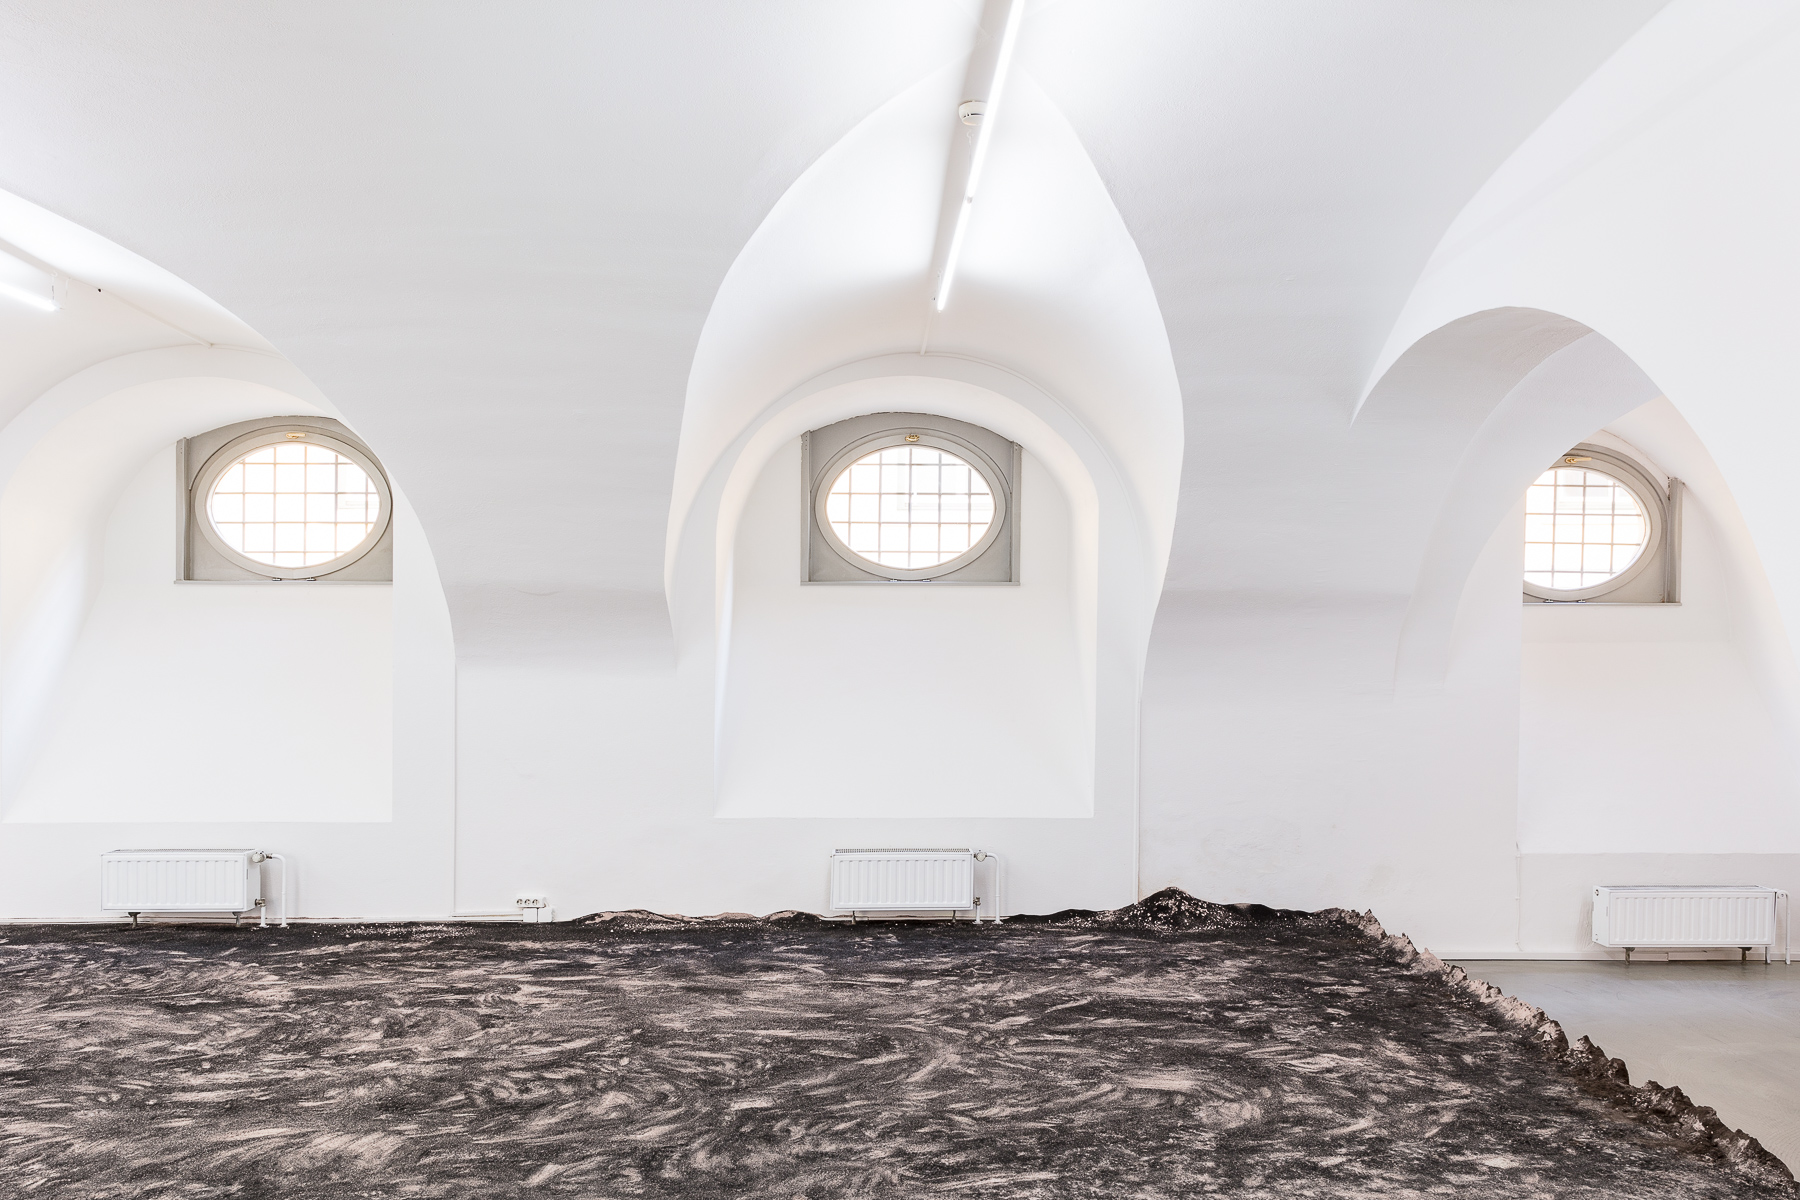 2019_02_19_Angelika Loderer_Kunstverein Graz_by_kunstdokumentationcom_007_web.jpg